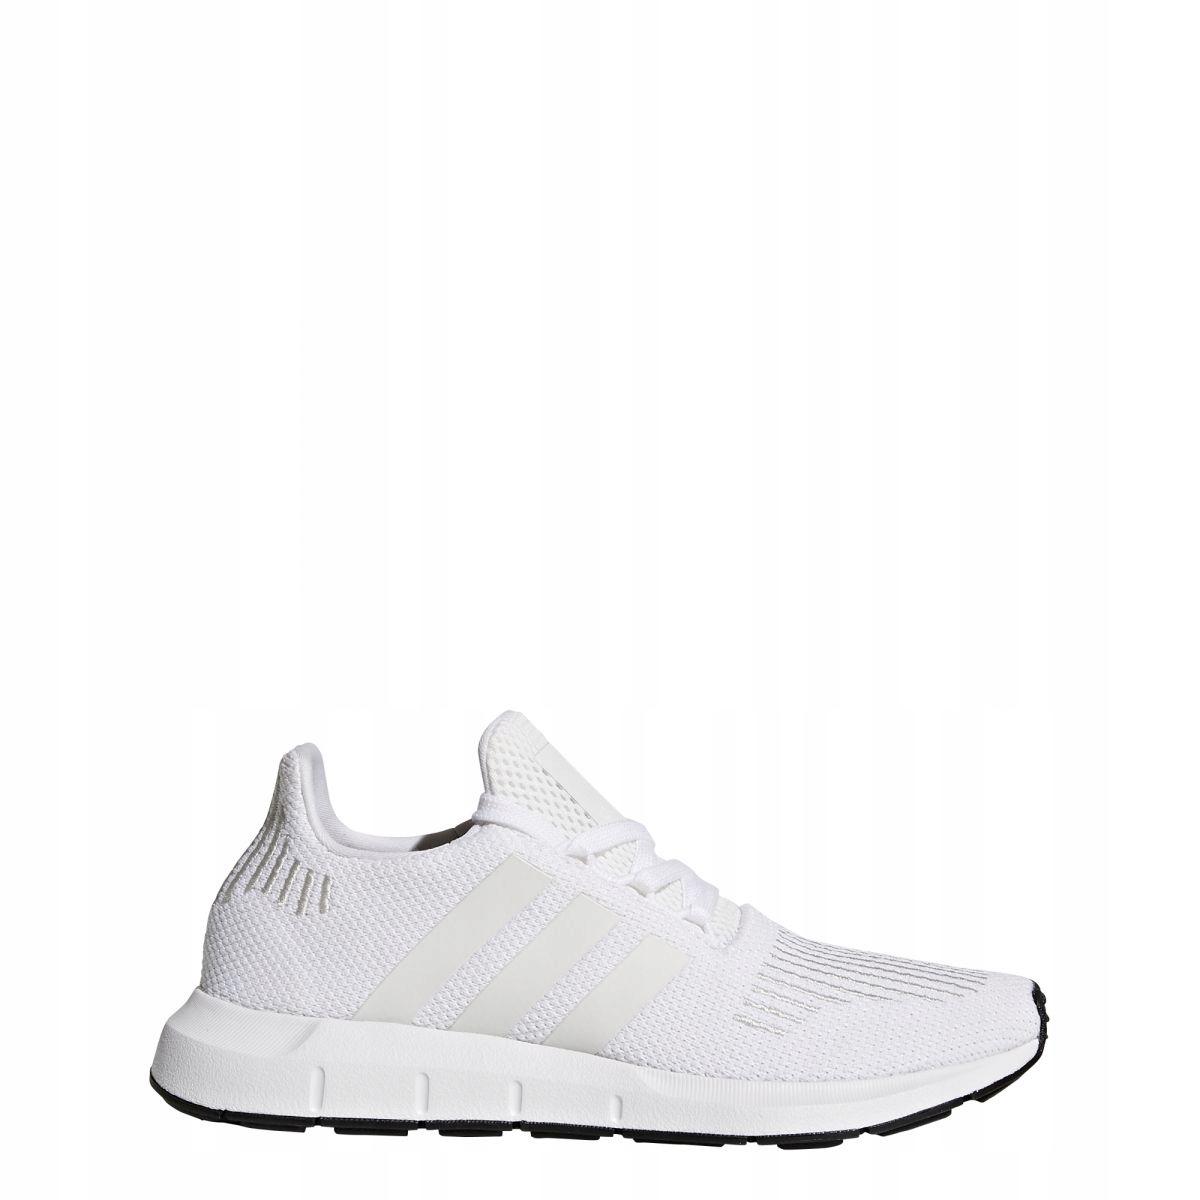 1c6bb7d4 Buty damskie adidas Swift Run J CM7920 36 2/3 - 7693719452 ...